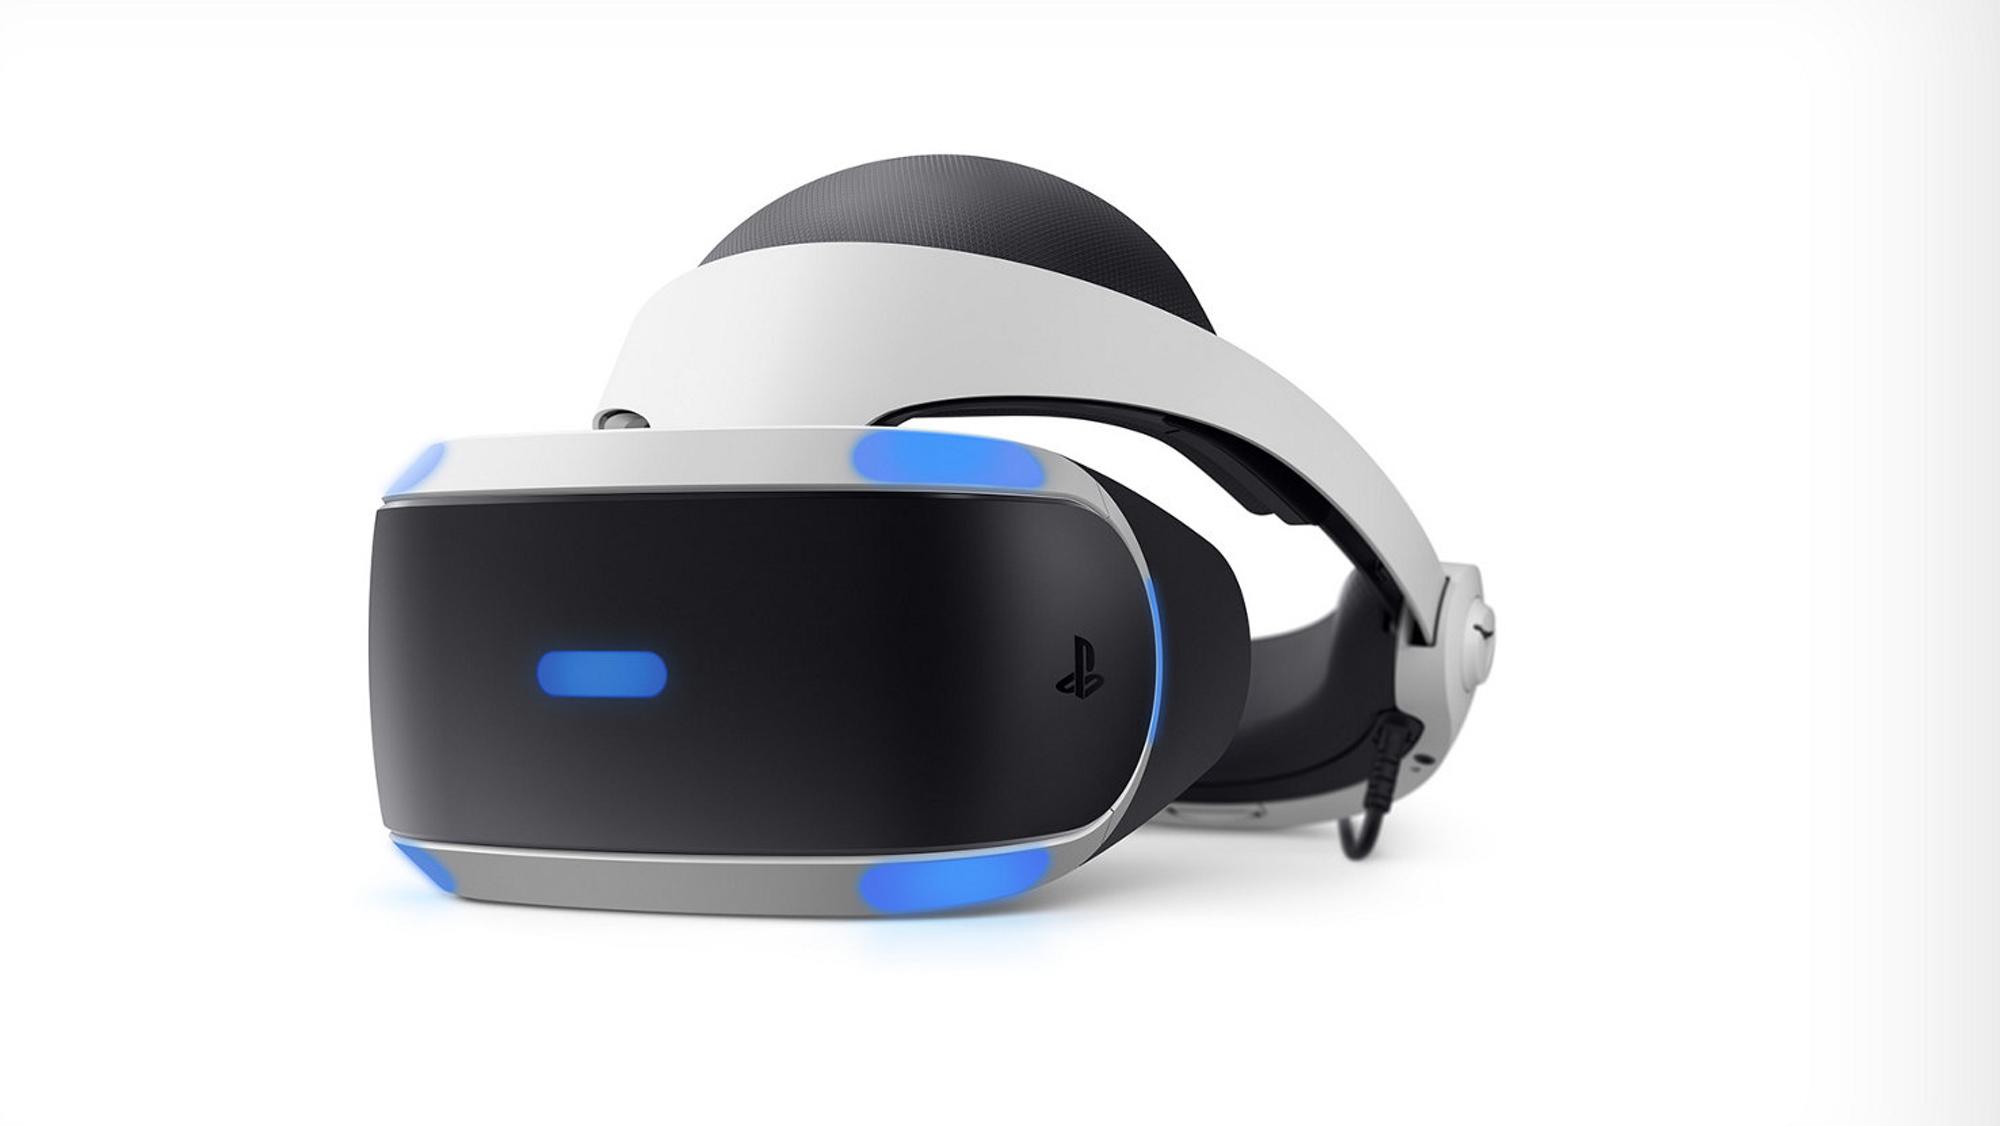 Sony grants Lenovo the privilege of using its PalytStation VR design